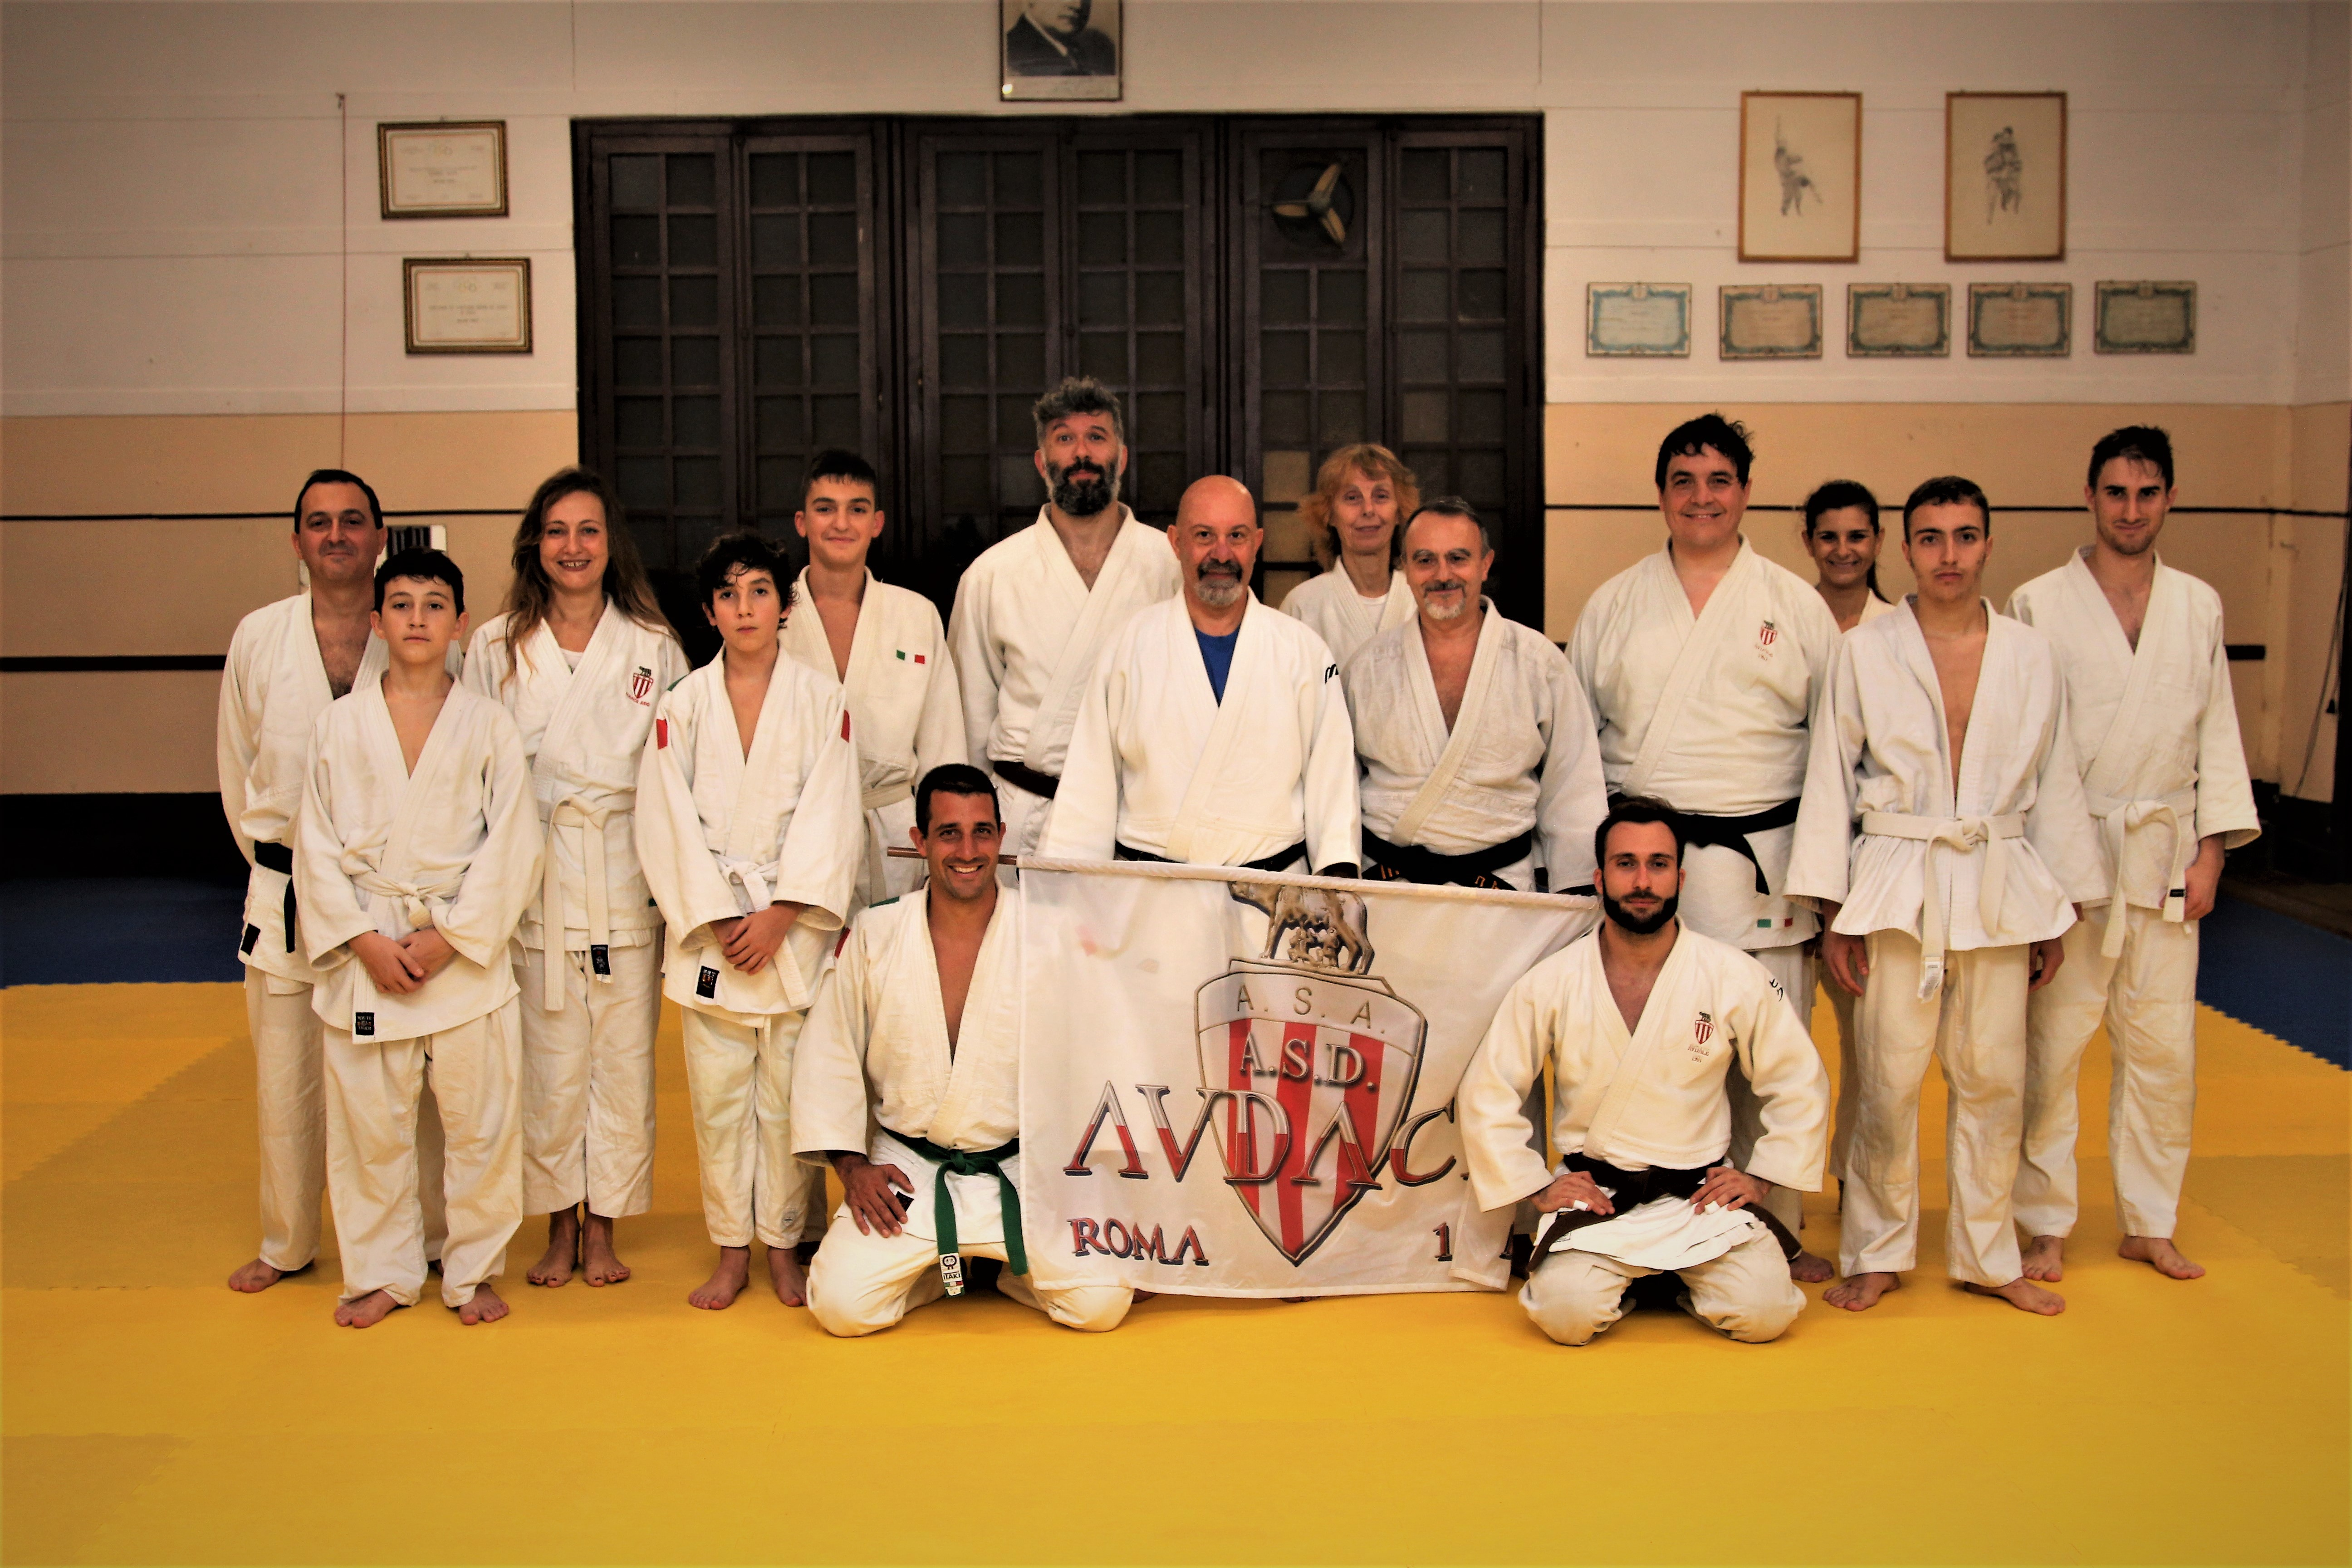 Audace dojo - Judo e Aikido a Roma